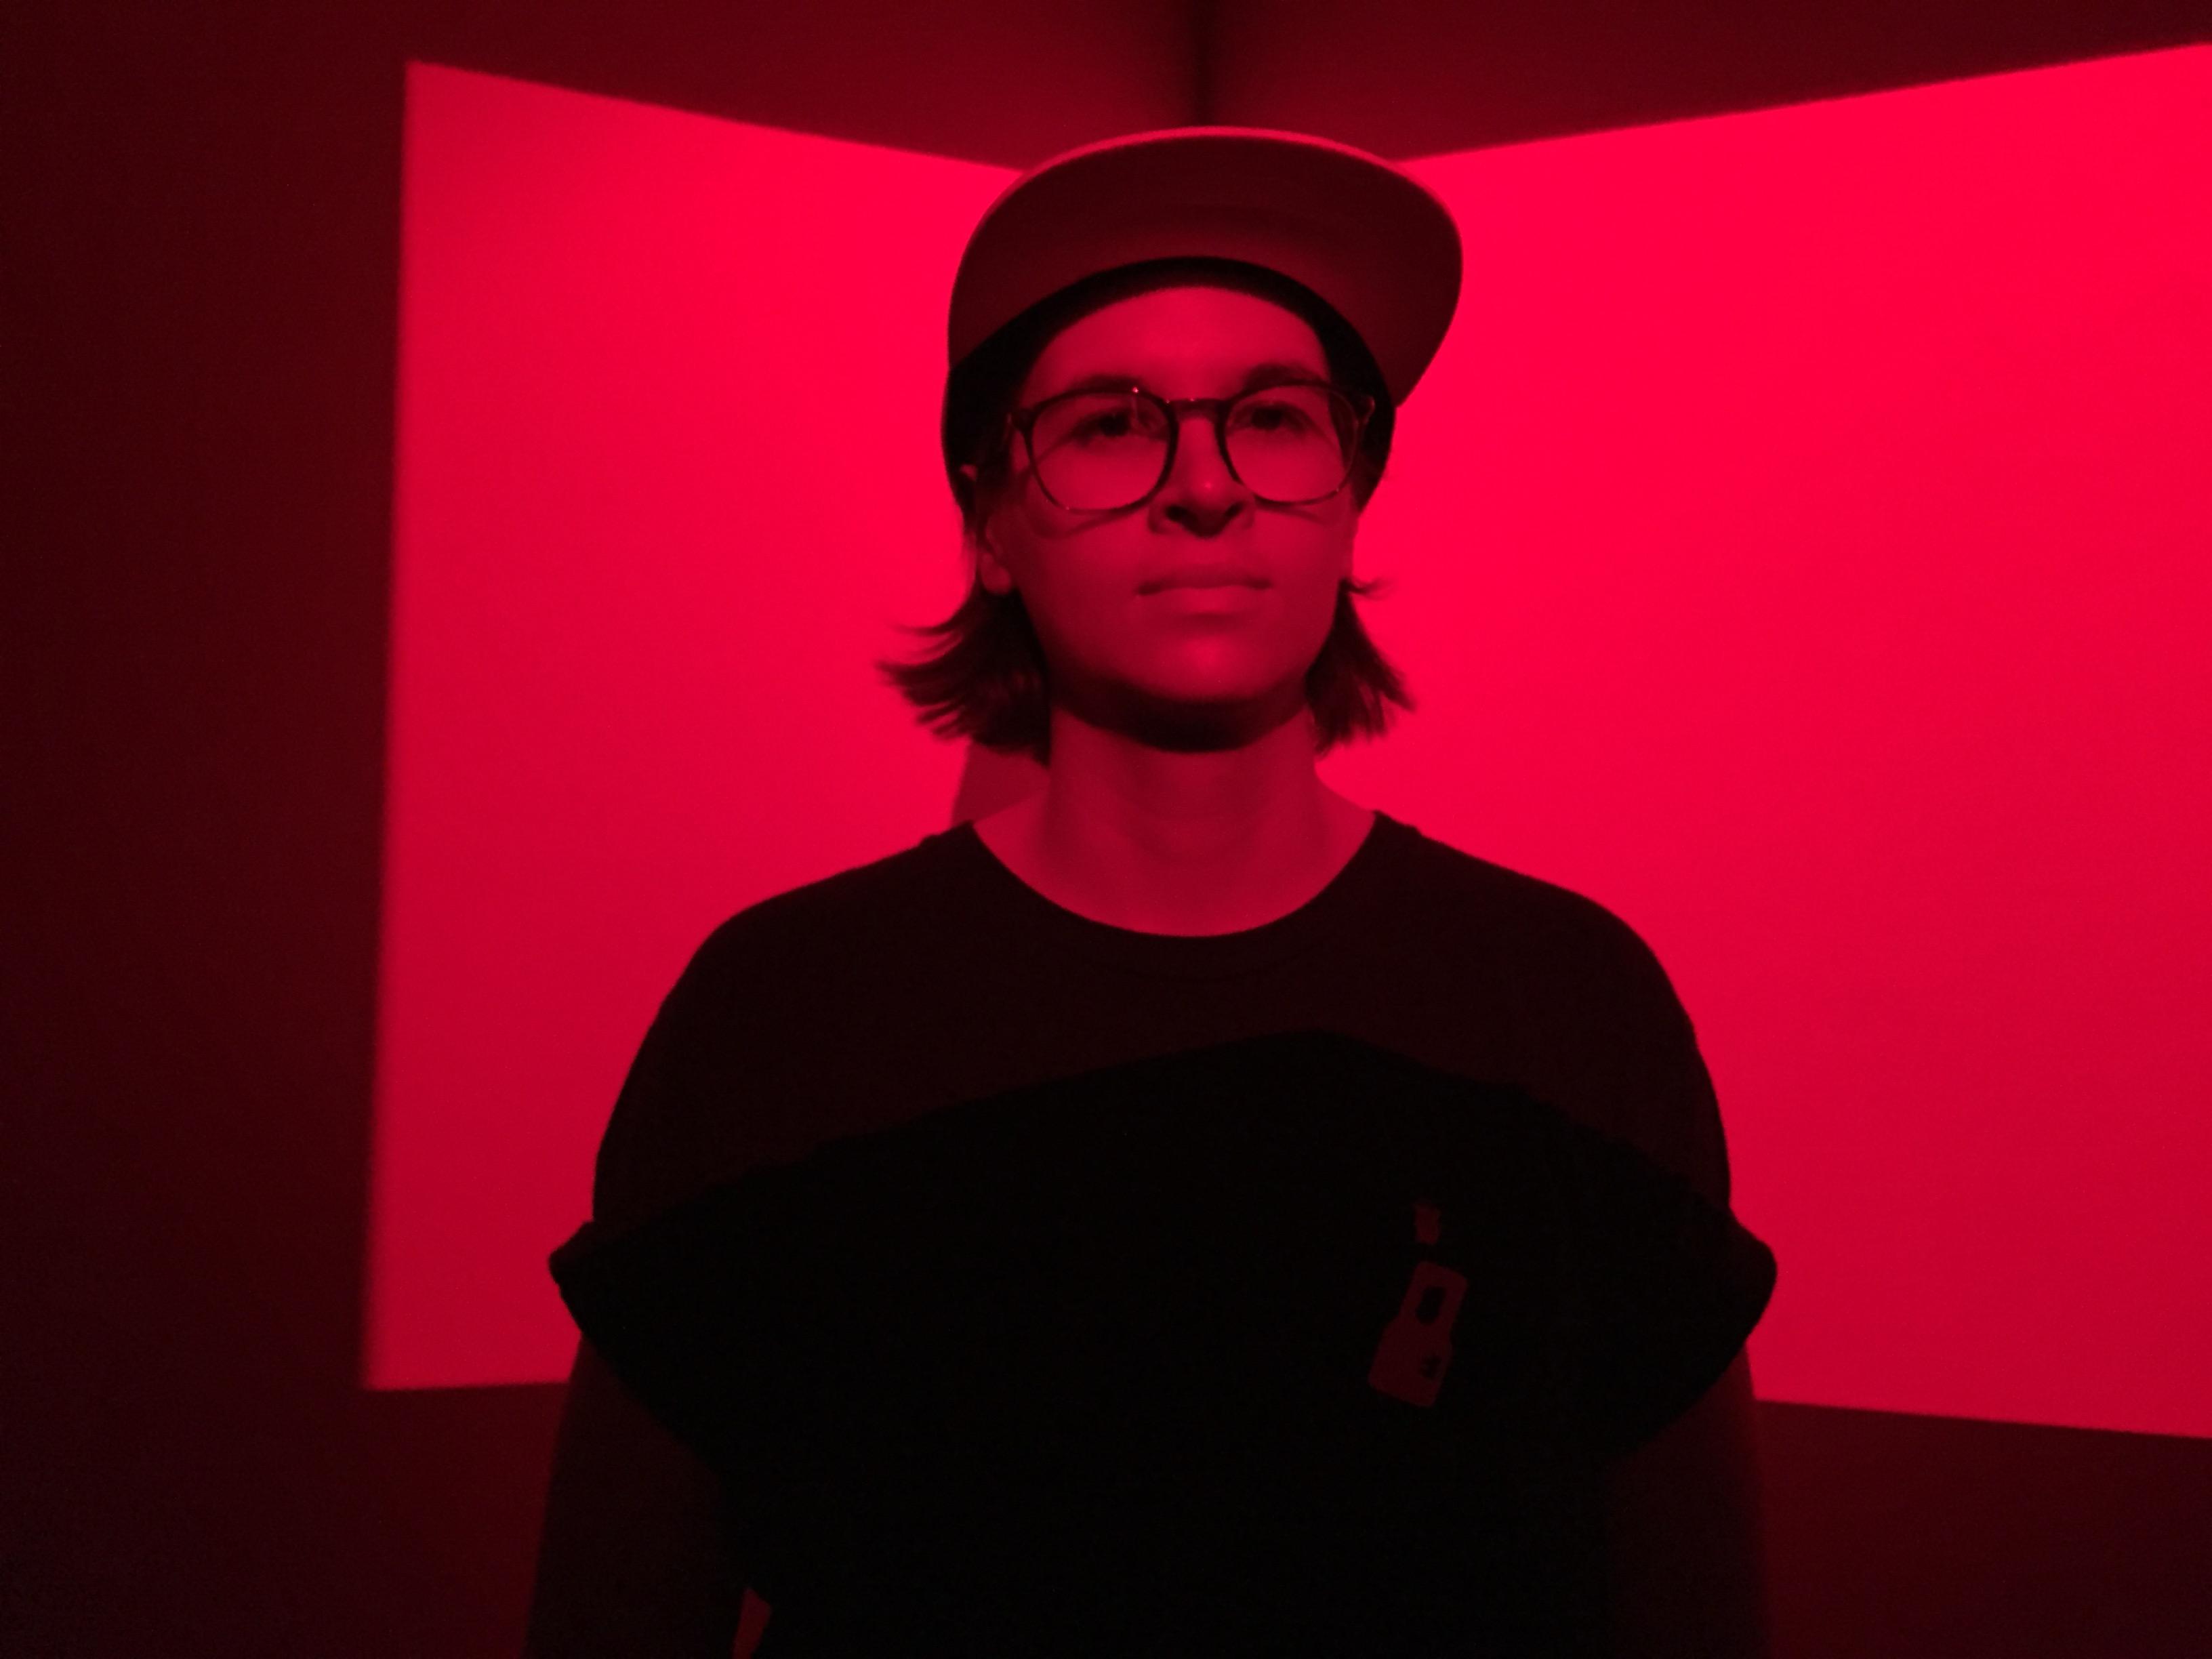 Red screened image of Adrienne Crossman